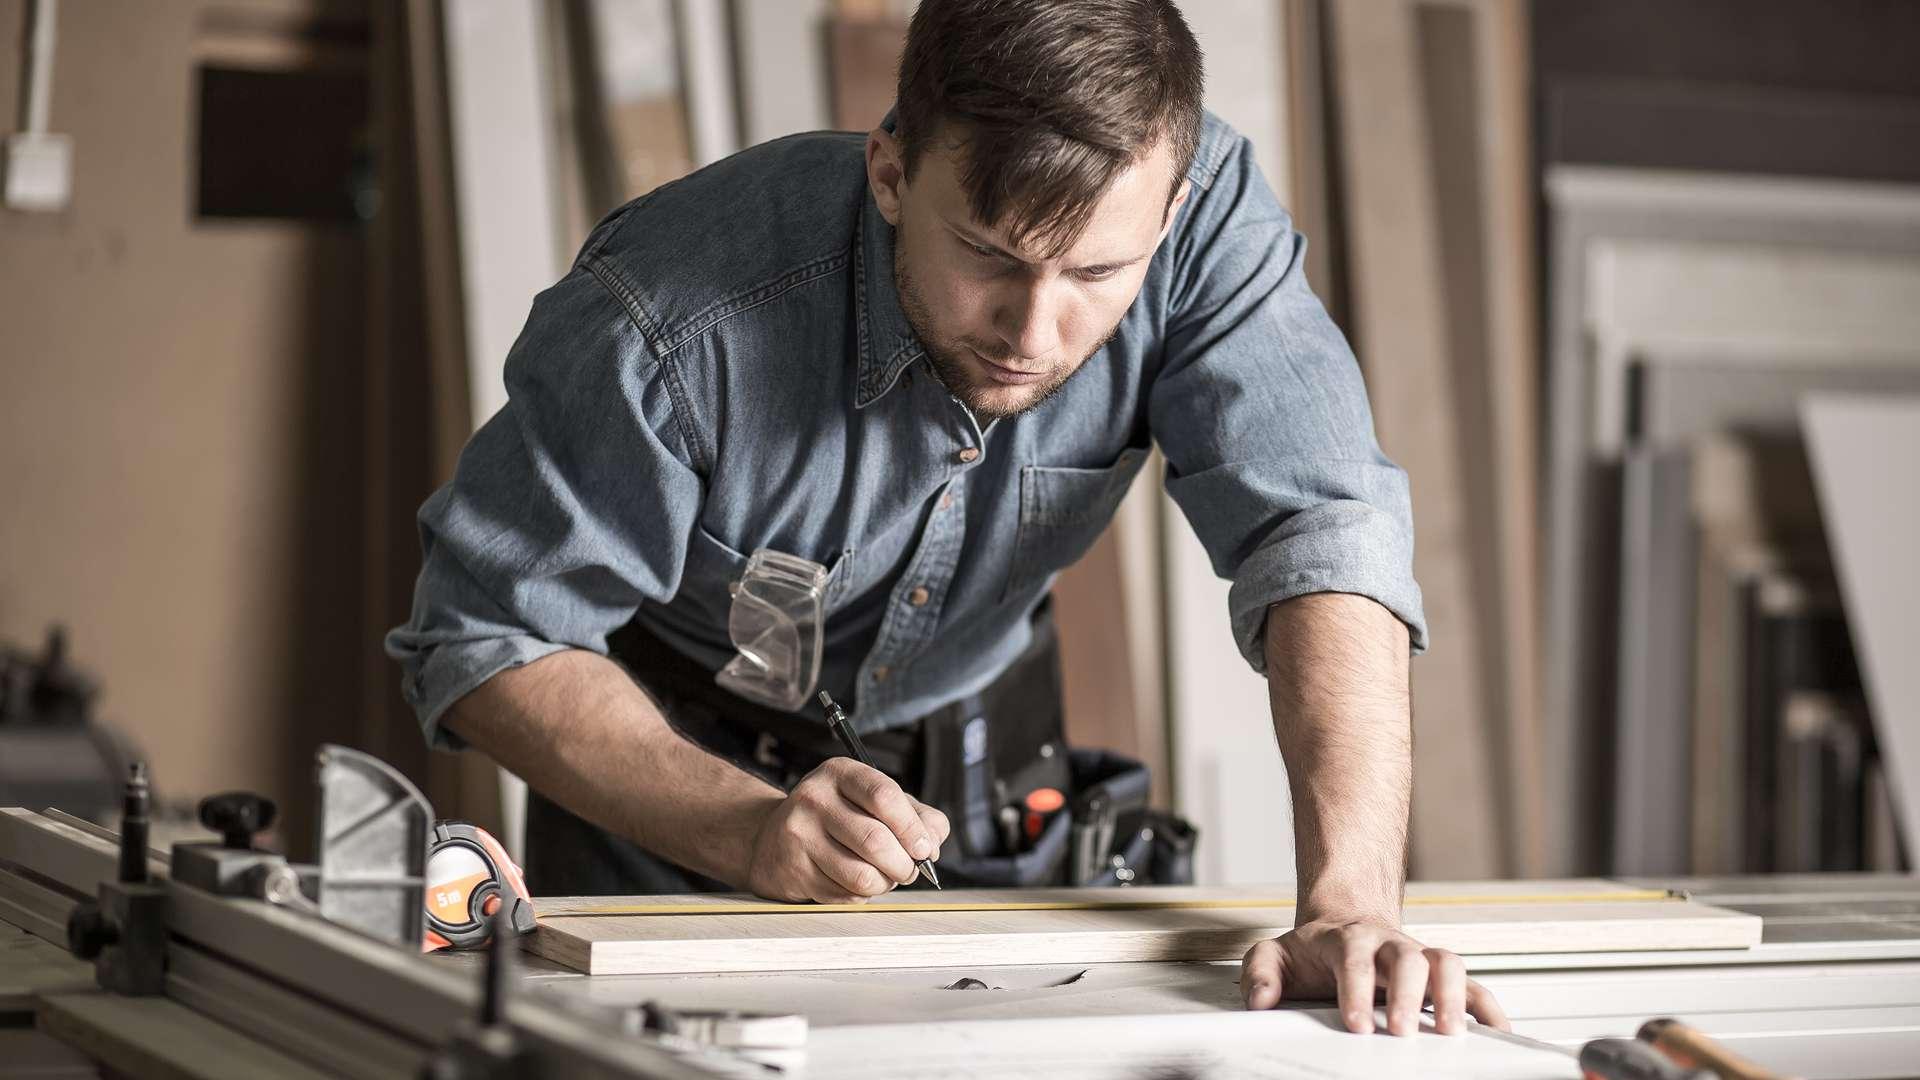 A man woodworking